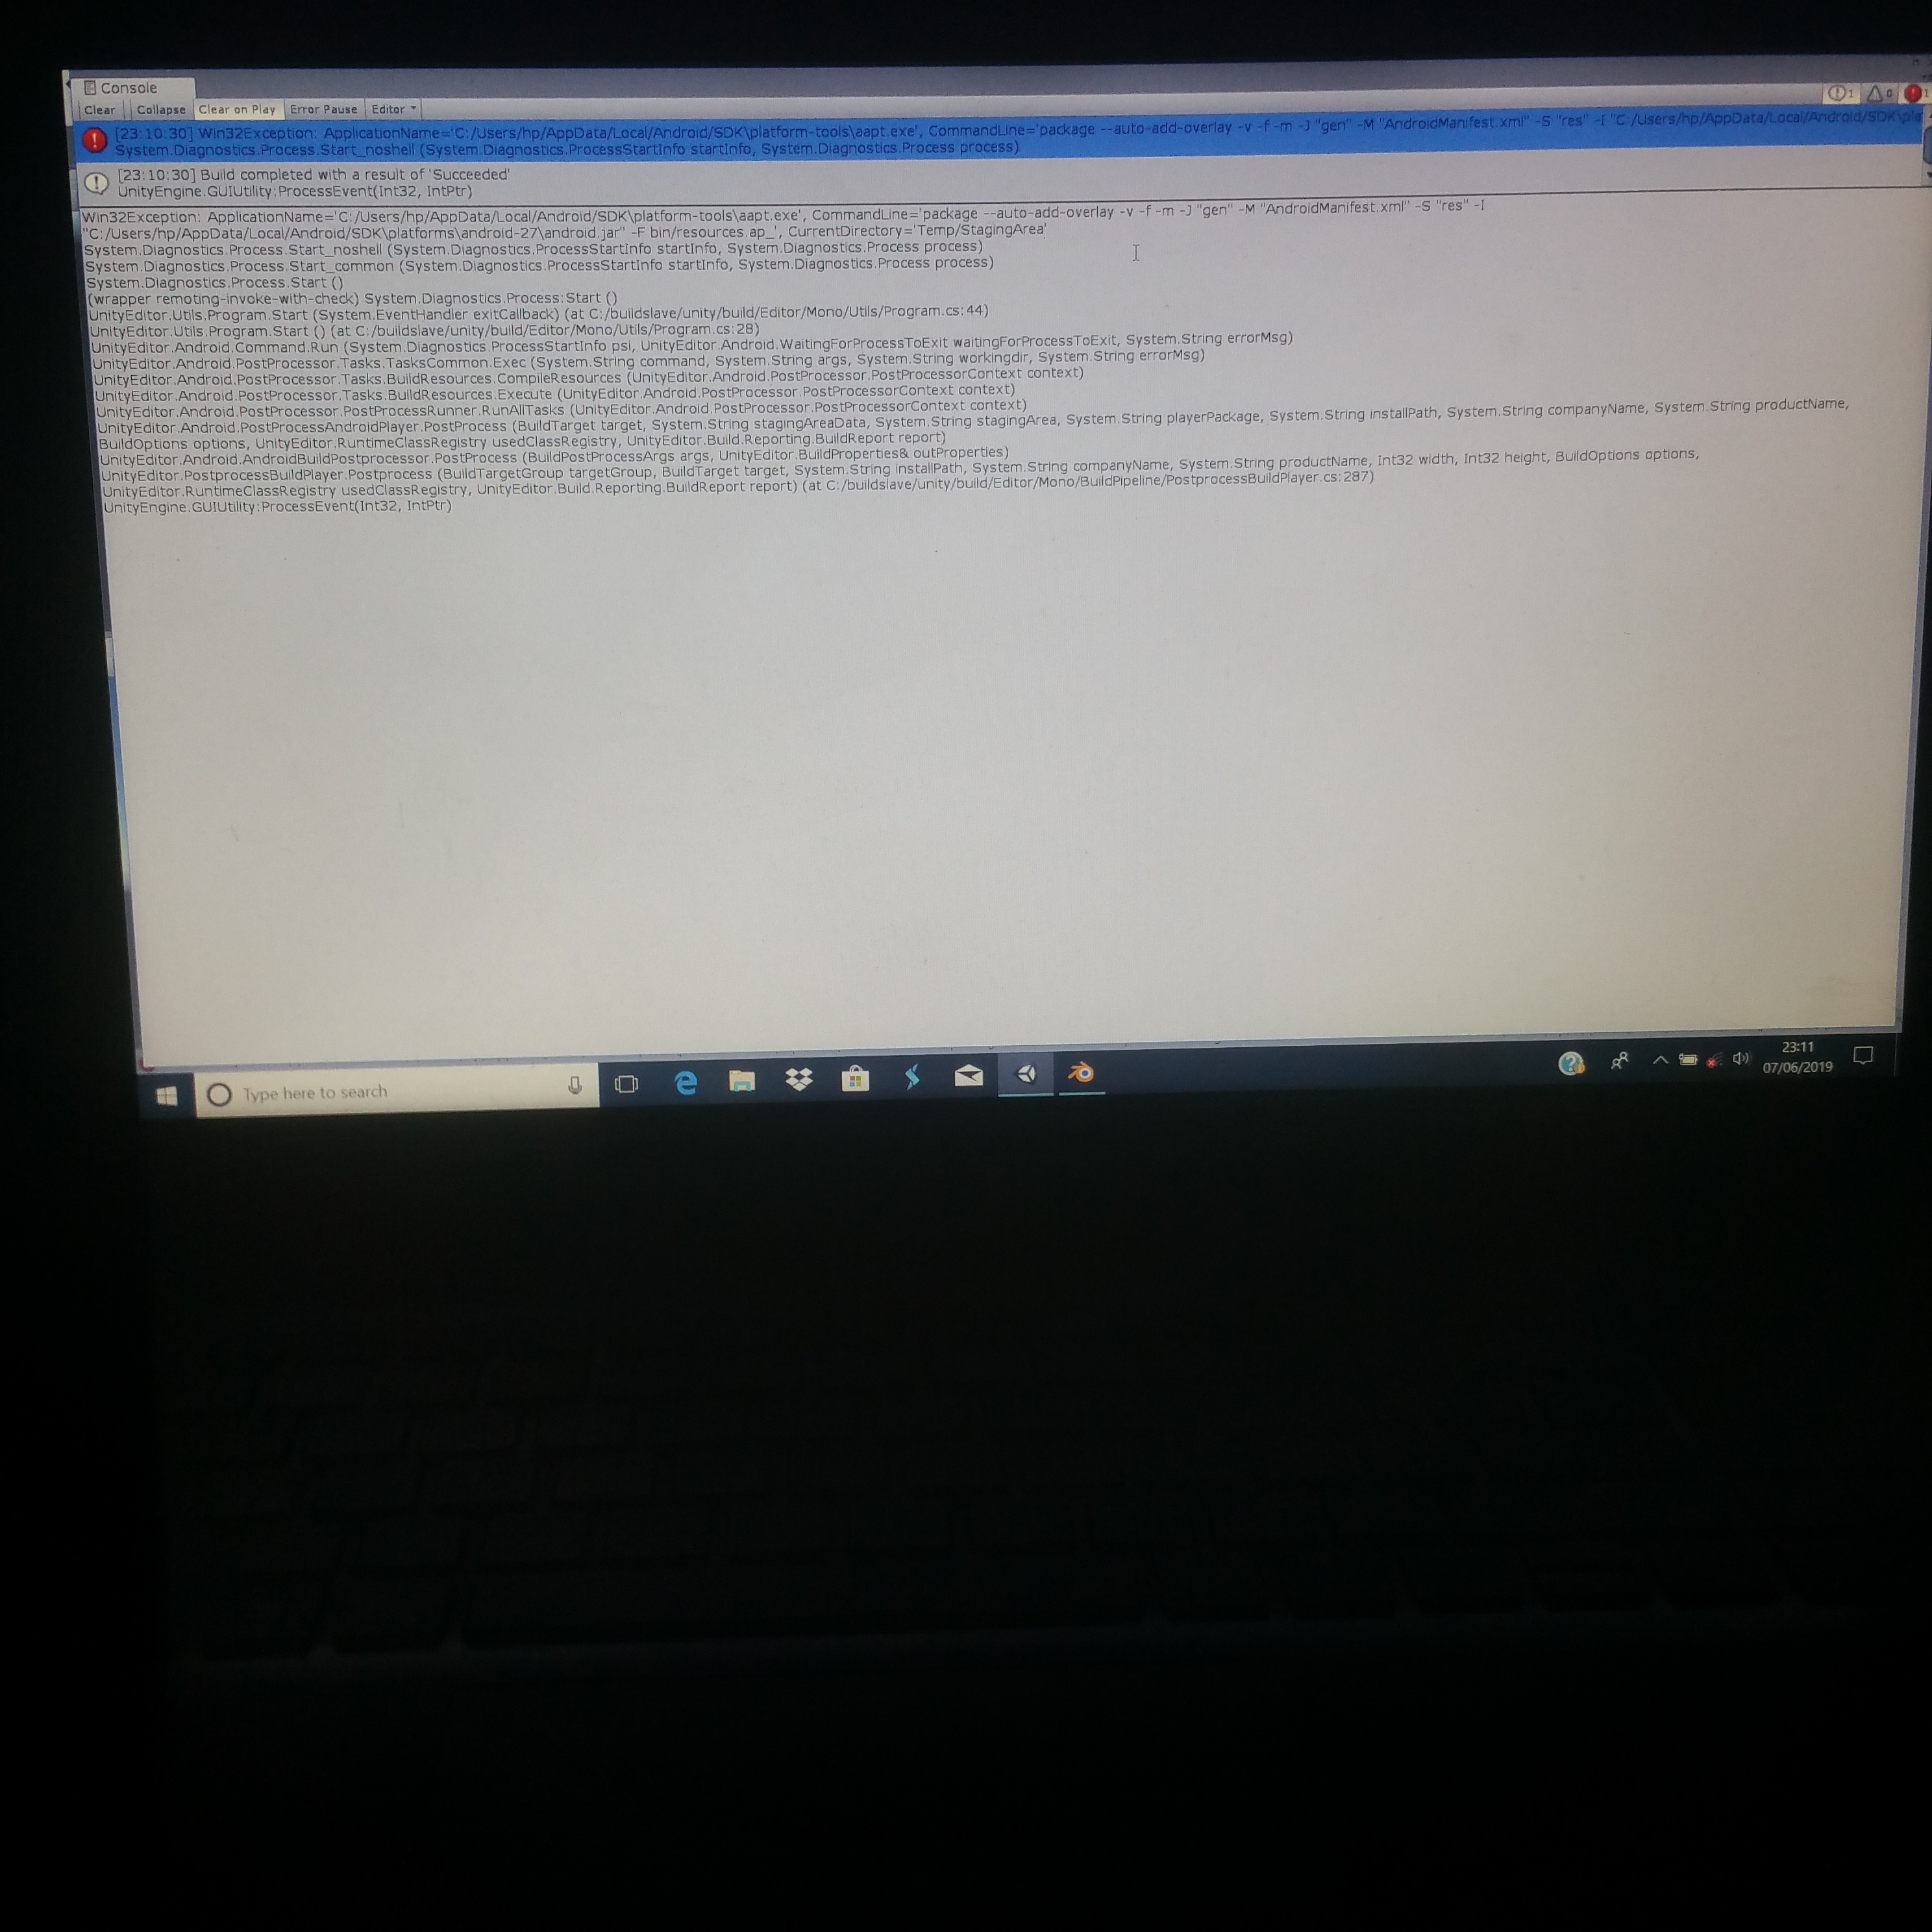 Apk build succeeded but my app doesn't exist - Unity Forum